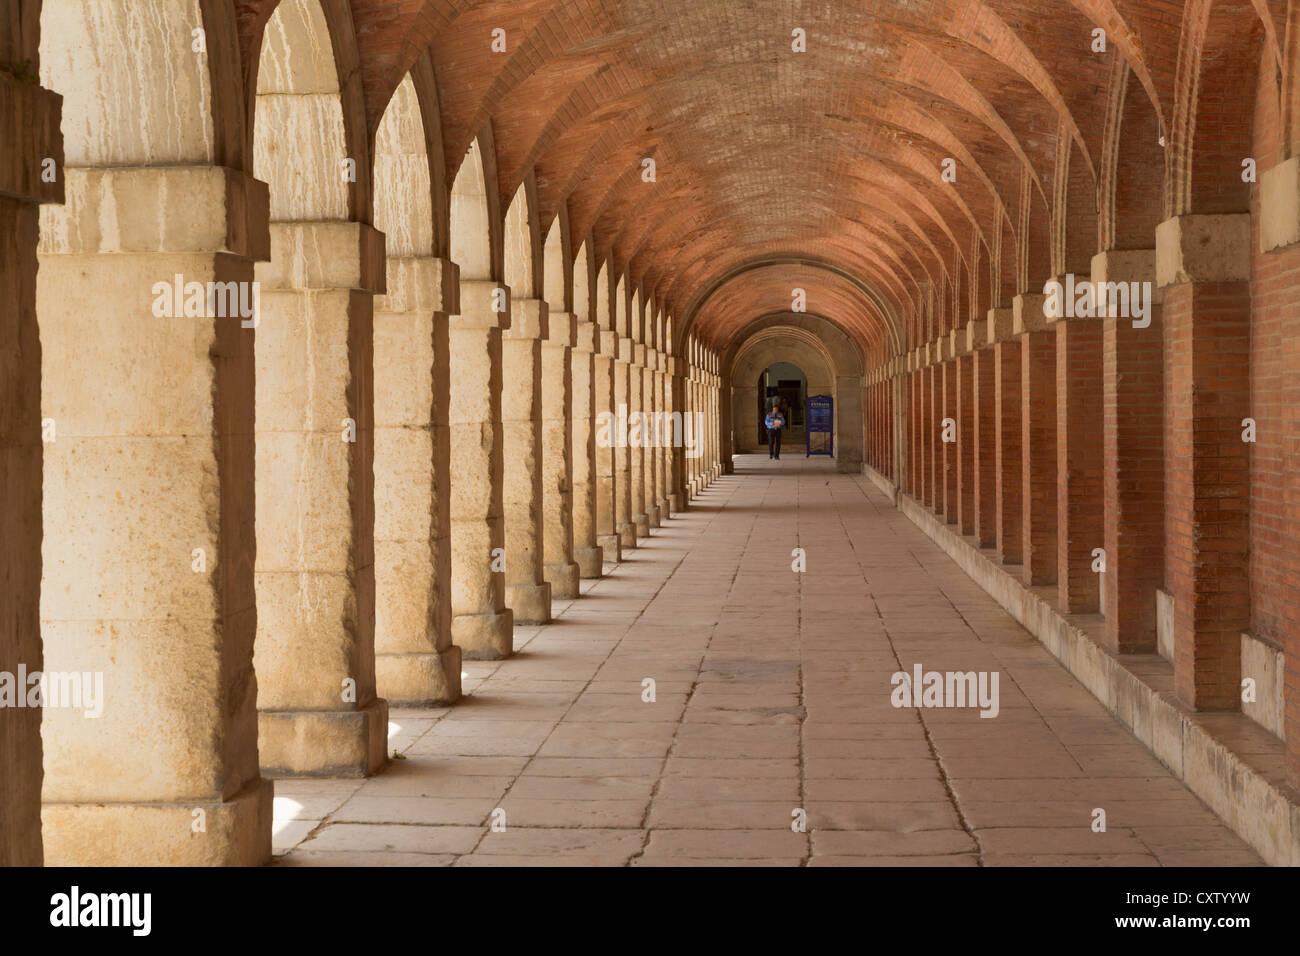 Aranjuez, Comunidad de Madrid, Spain. The Royal Palace. Arcaded passage. - Stock Image